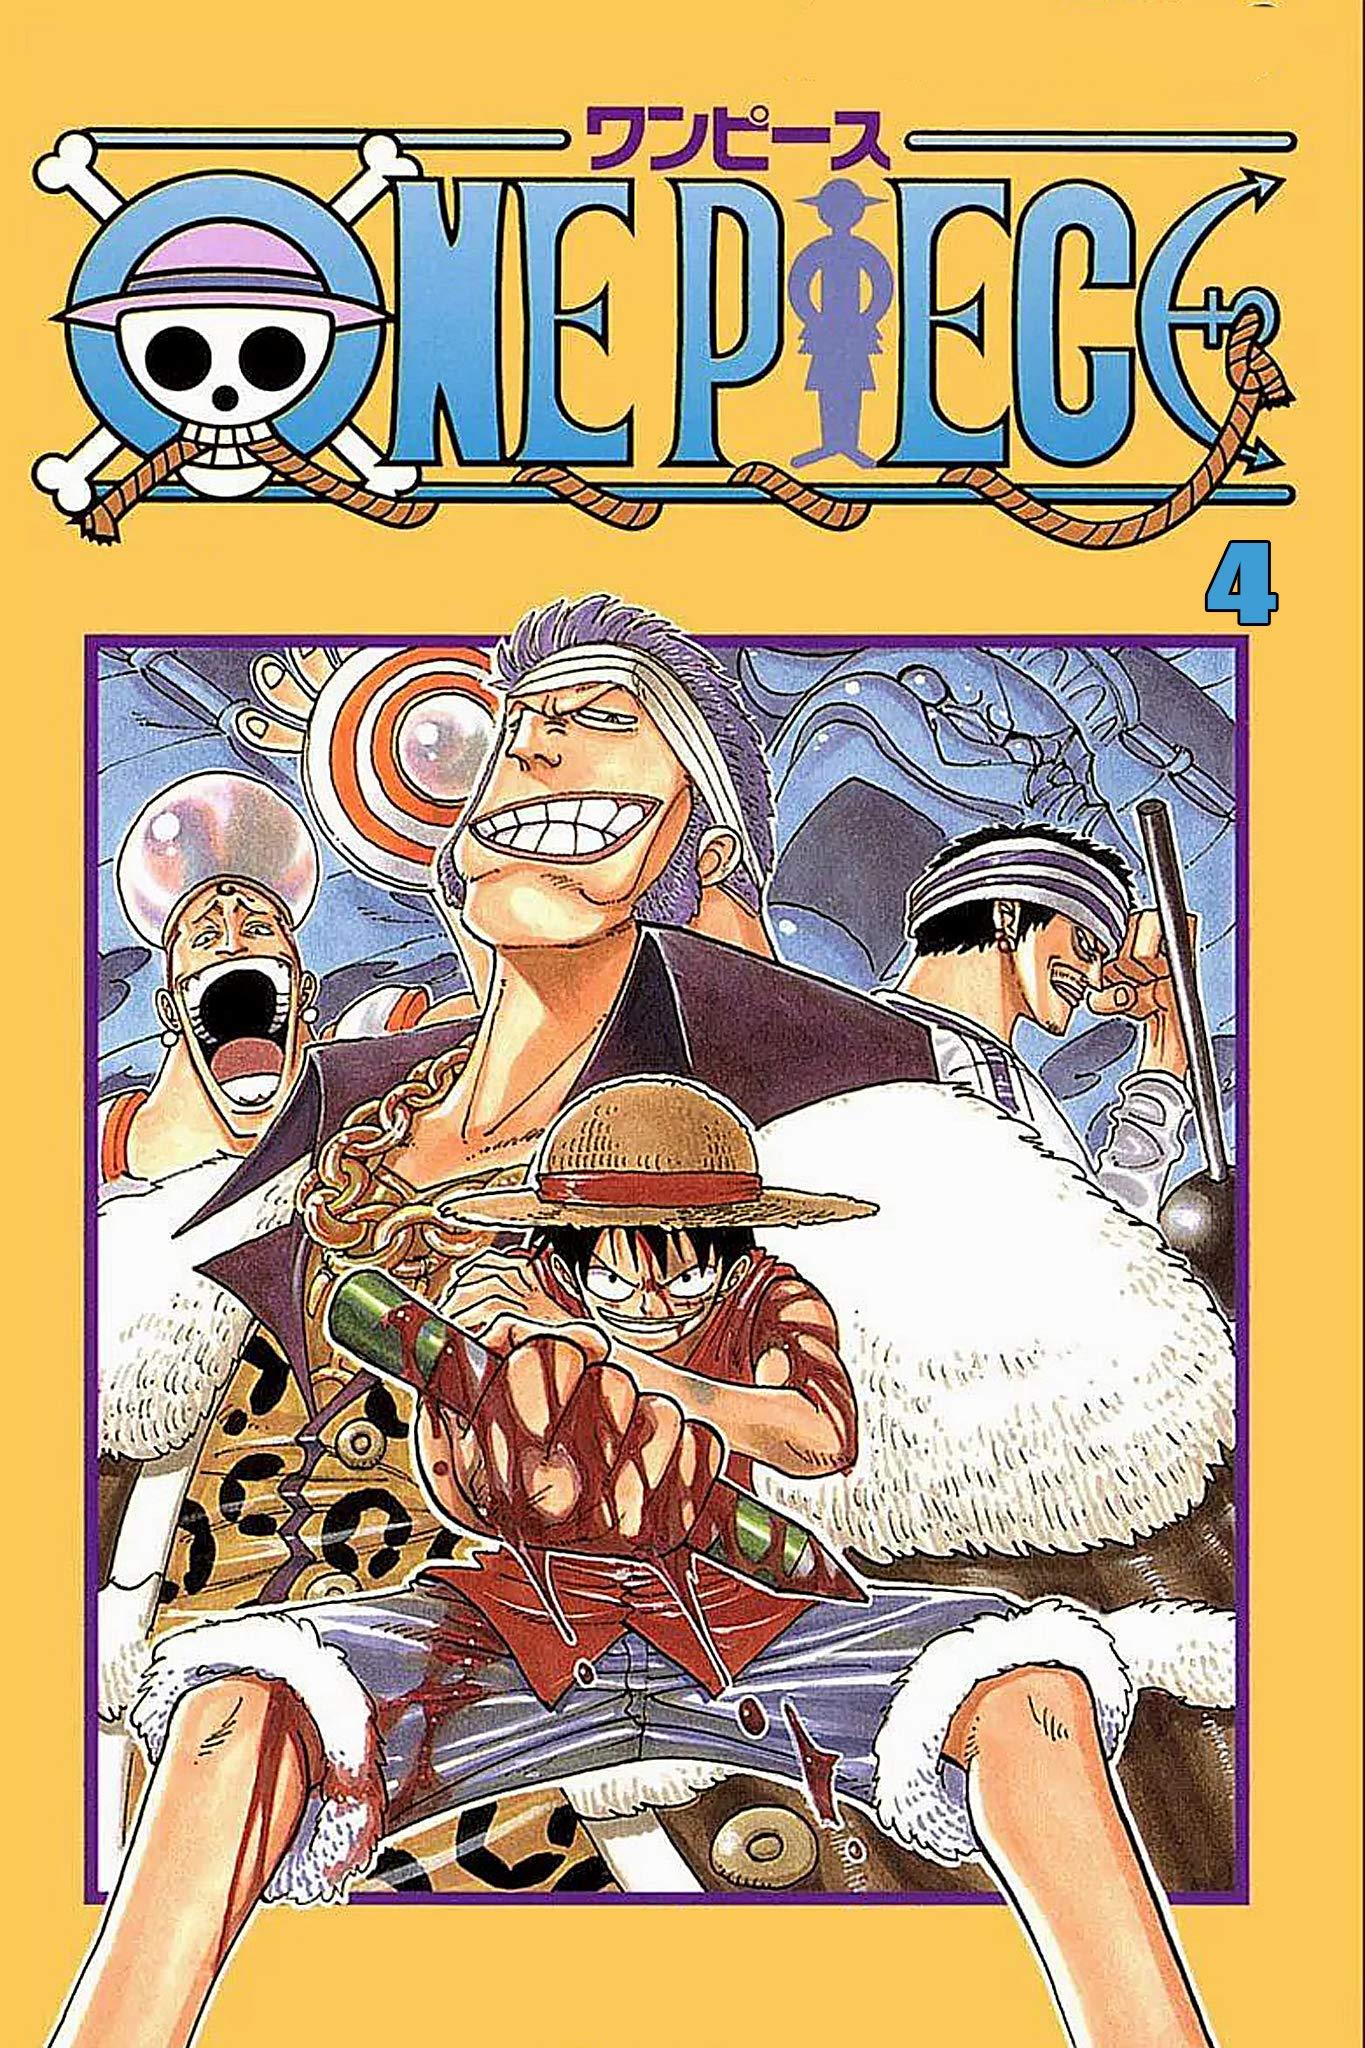 The Best Manga Fantasy: One Piece Full Volume 4